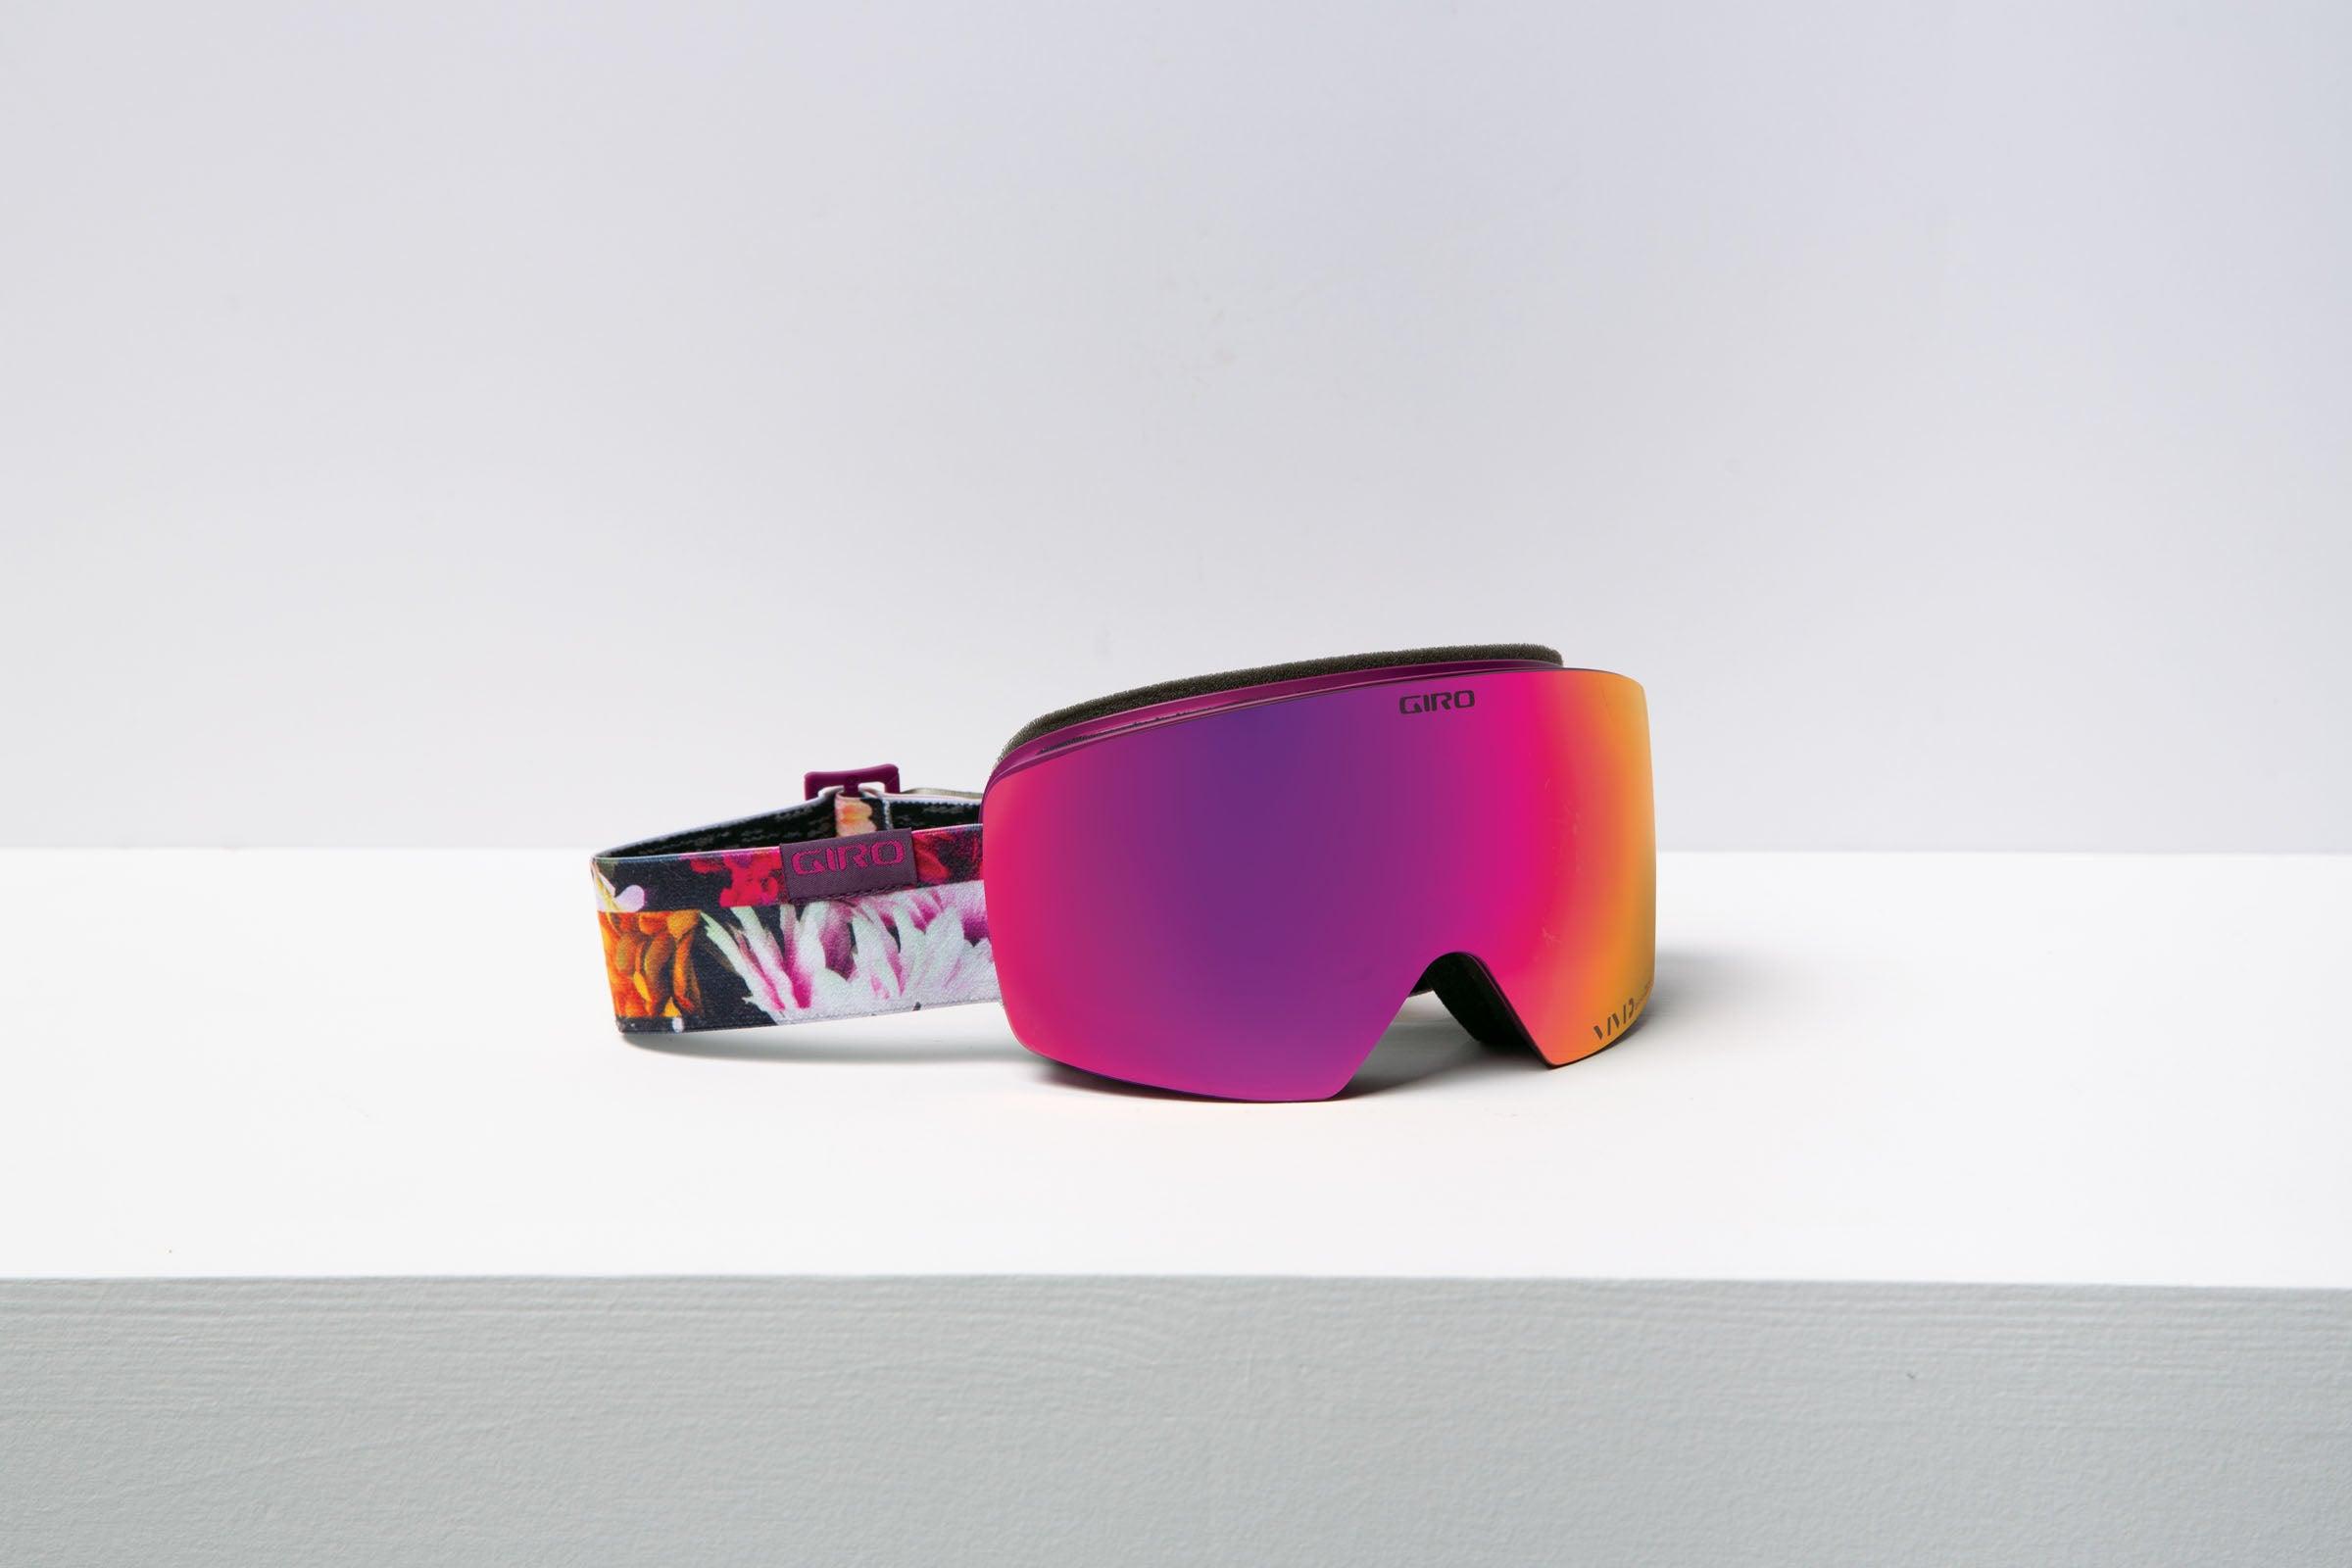 2022 Giro Contour RS goggles